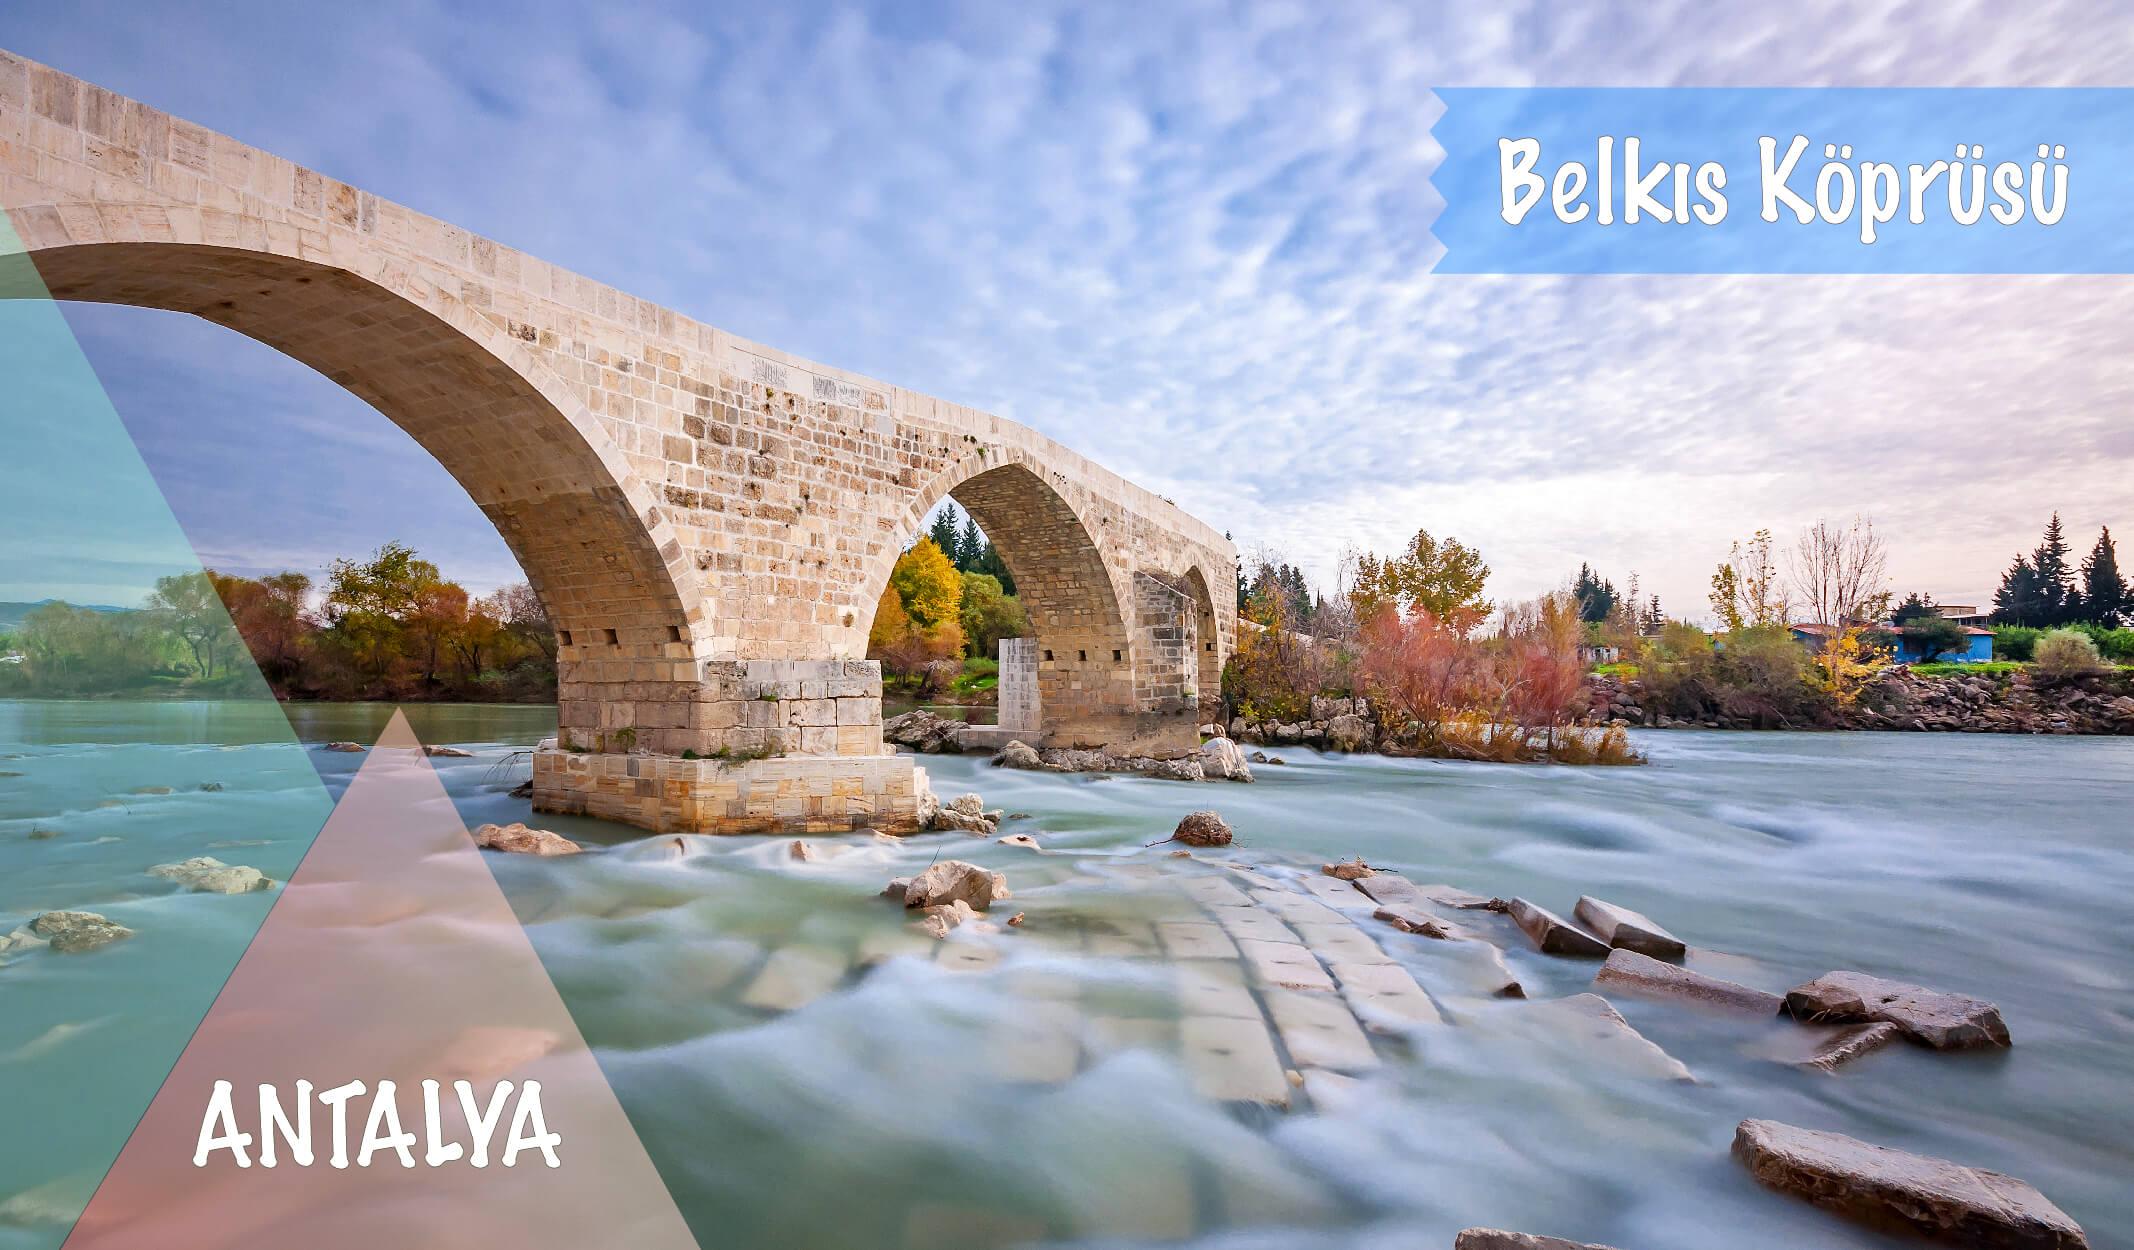 belkıs köprüsü